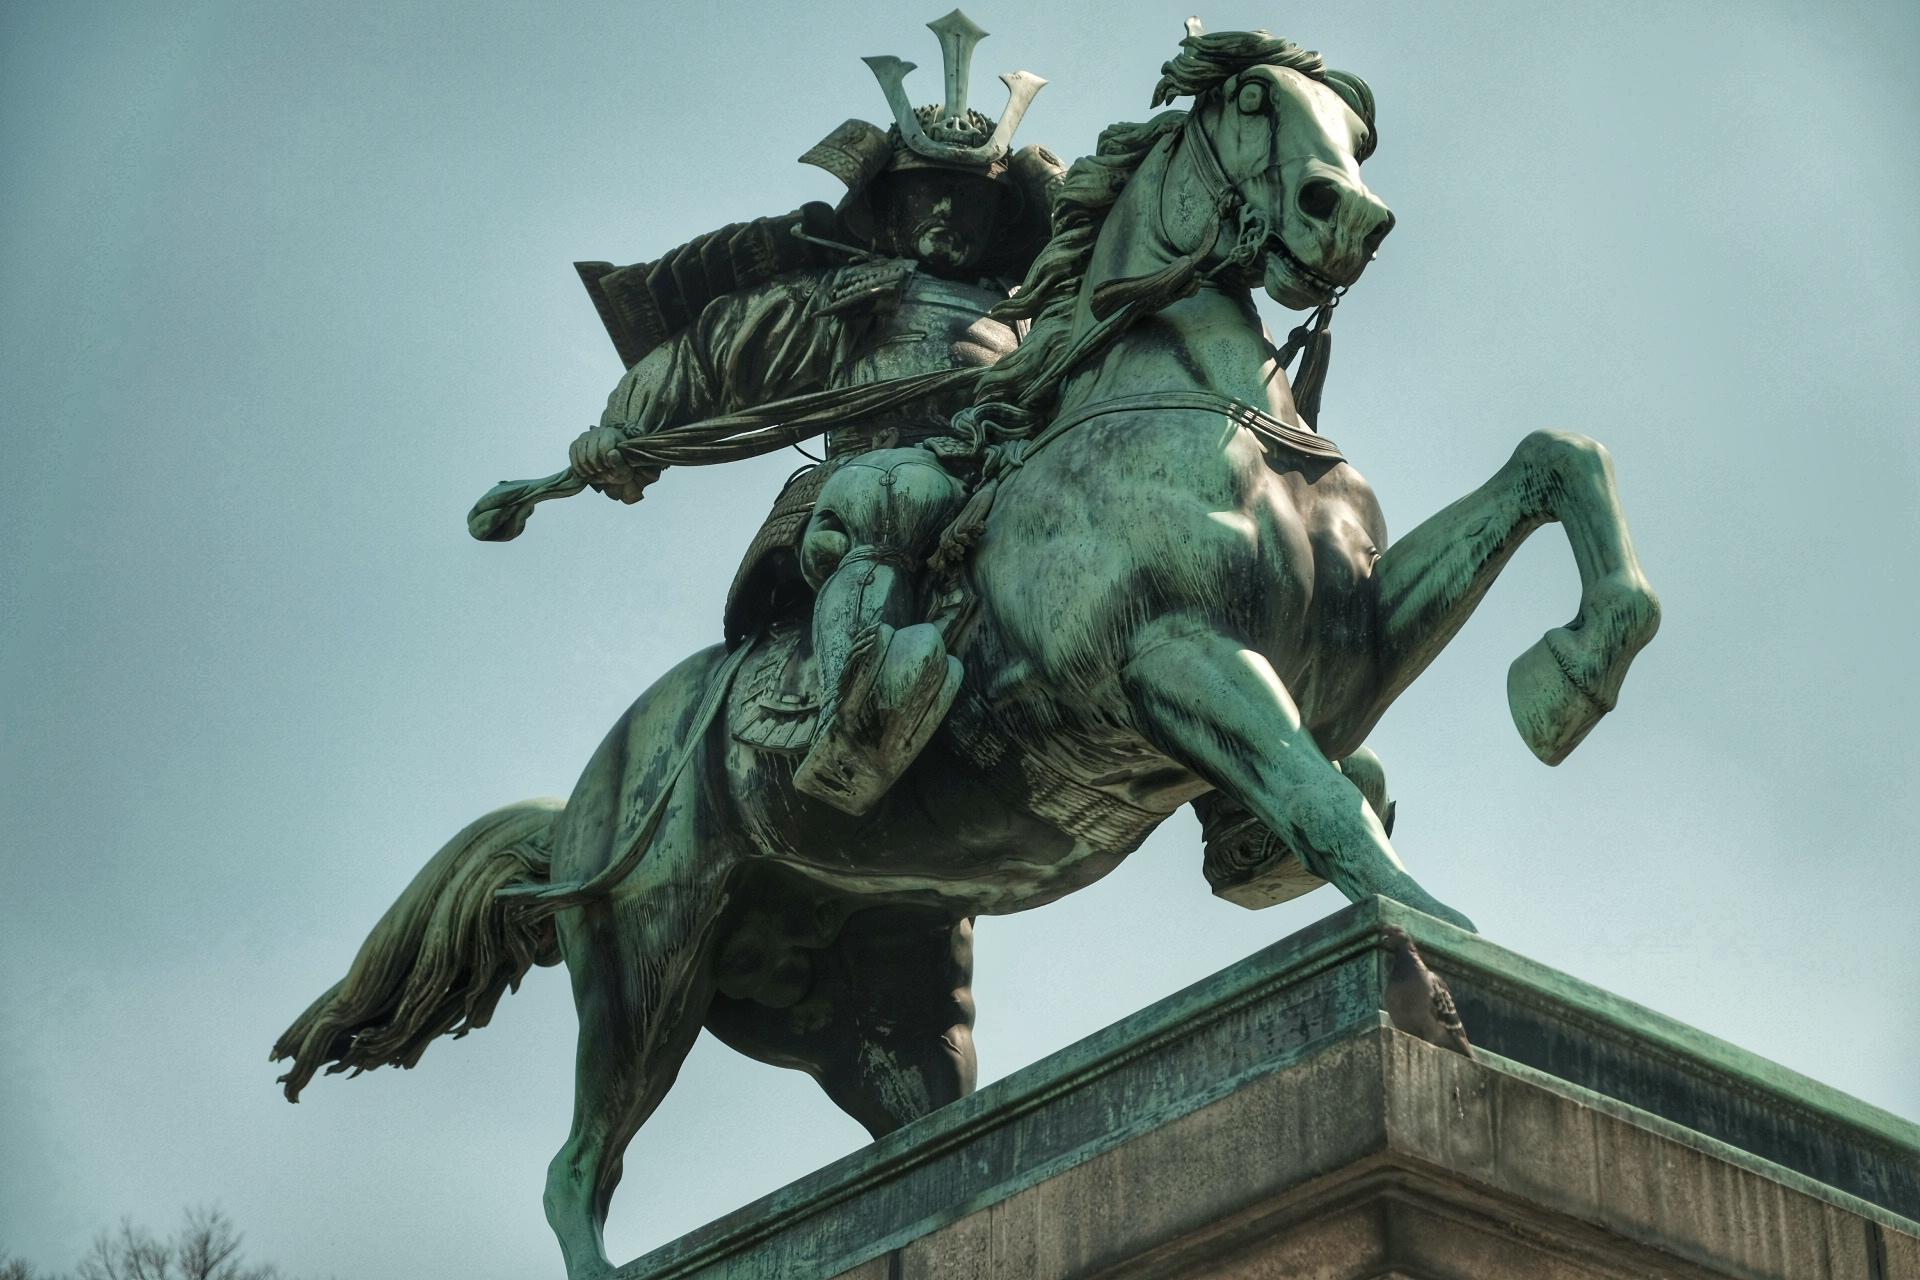 Statue of Samurai Kusunoki Masashige outside Tokyo's Imperial Palace.